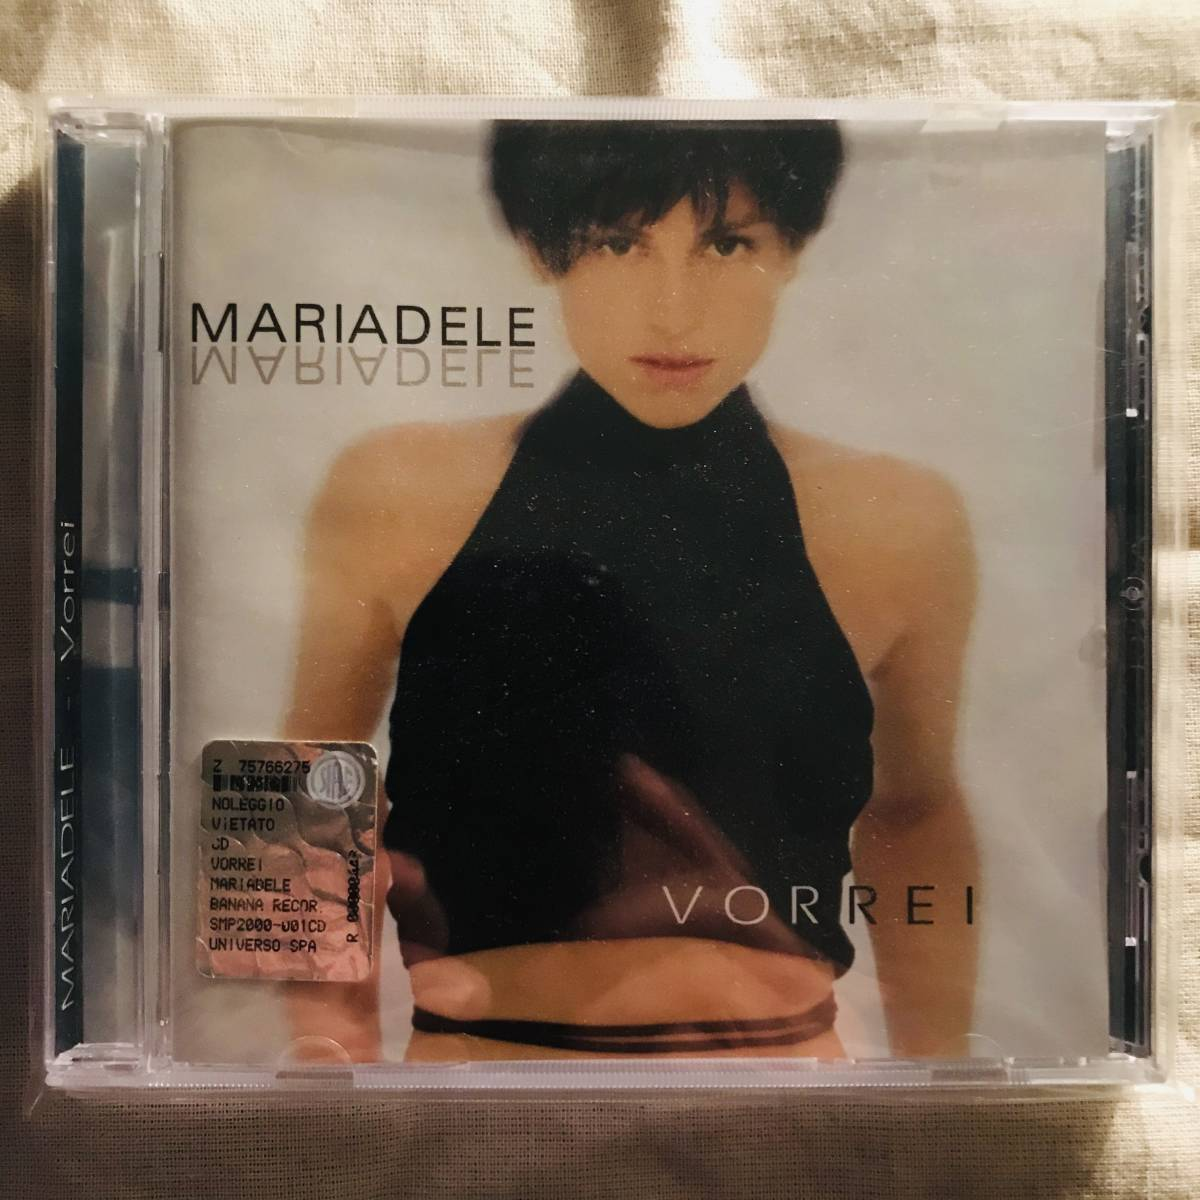 【CD Album】Mariadele/Vorrei Italy盤 Gabrielle/I Wish カバー